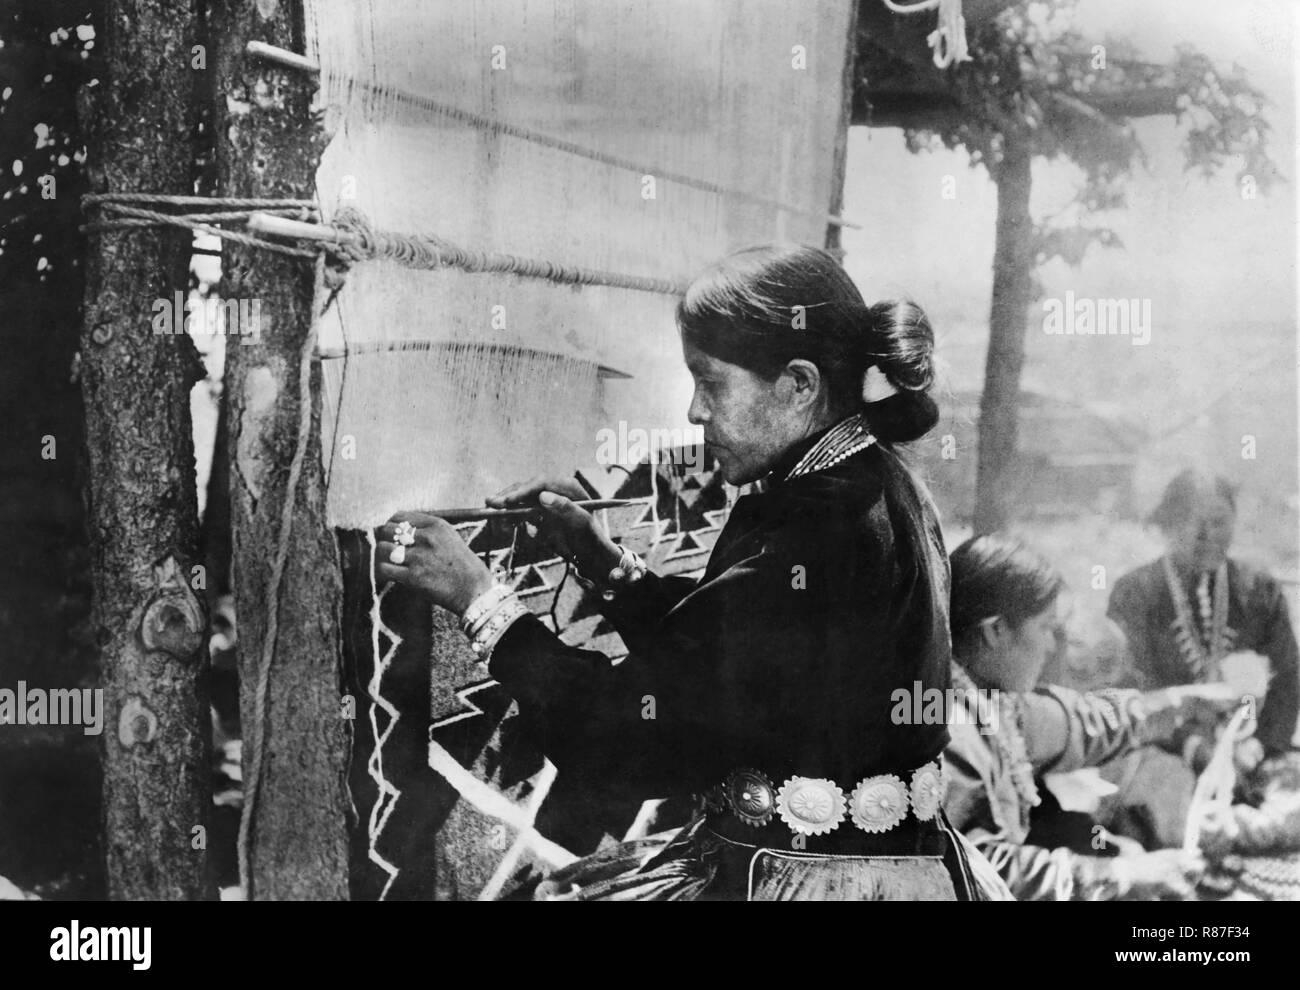 Navajo Indians Historical Stock Photos & Navajo Indians